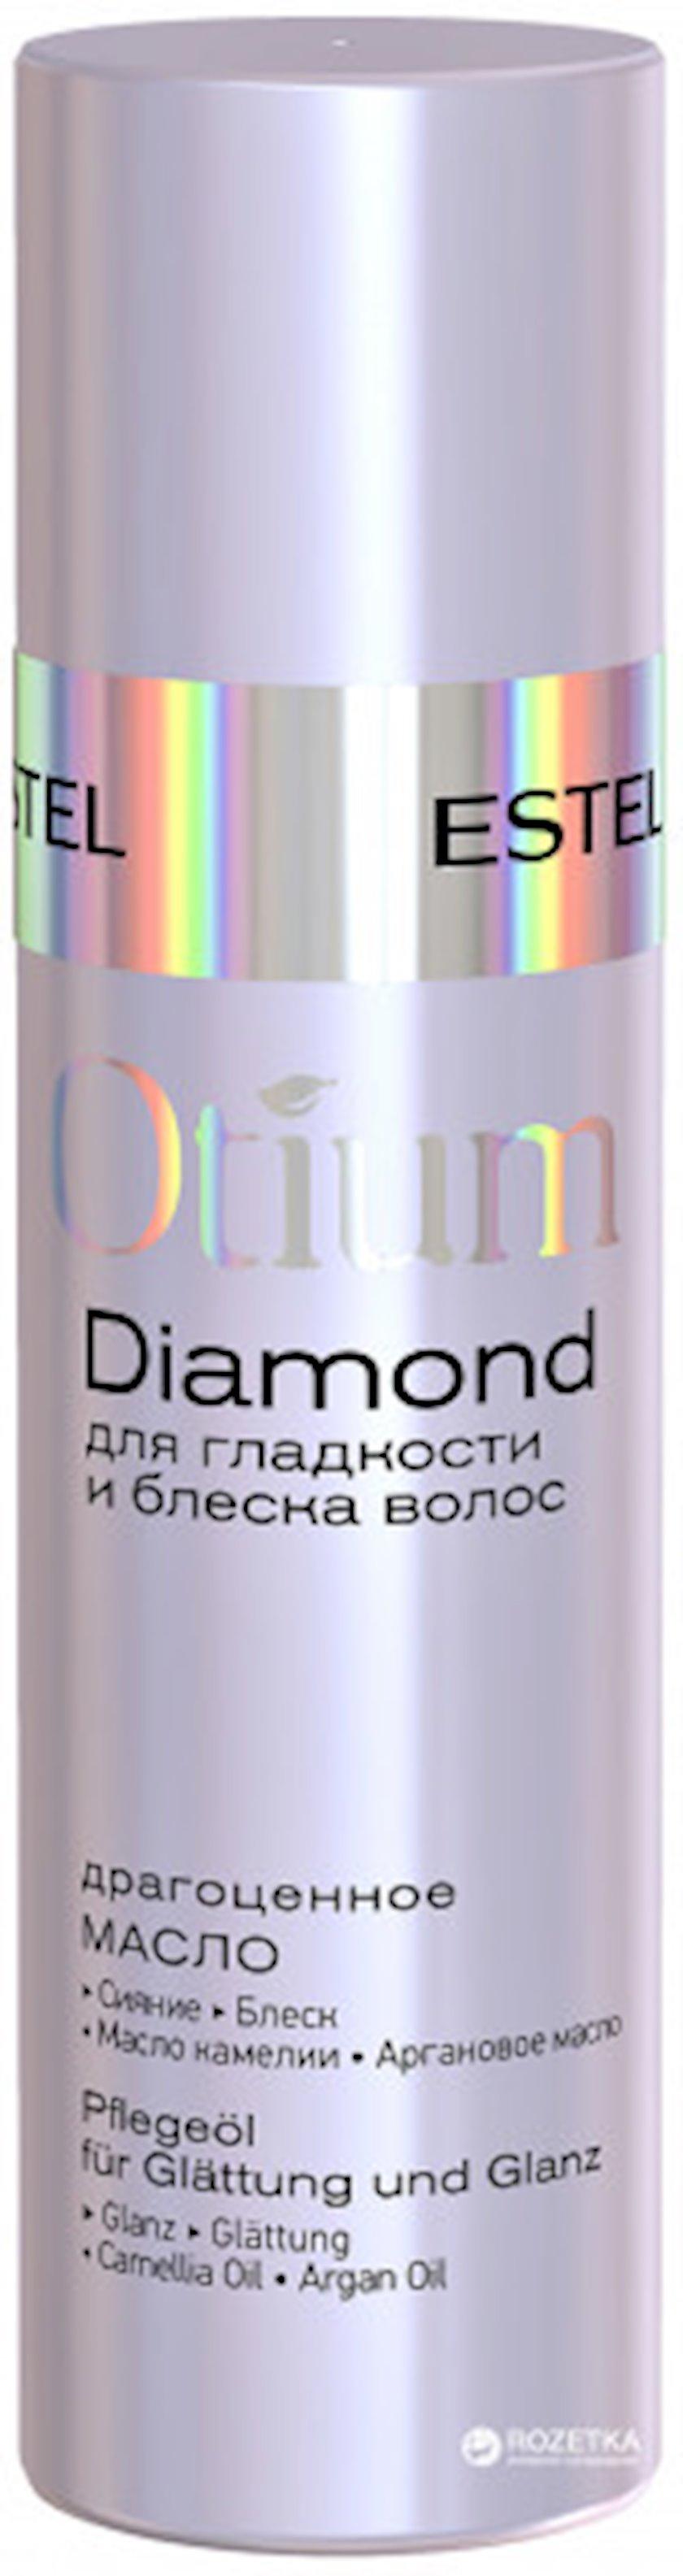 Saç yağı Estel Professional Otium Diamond, 100 ml